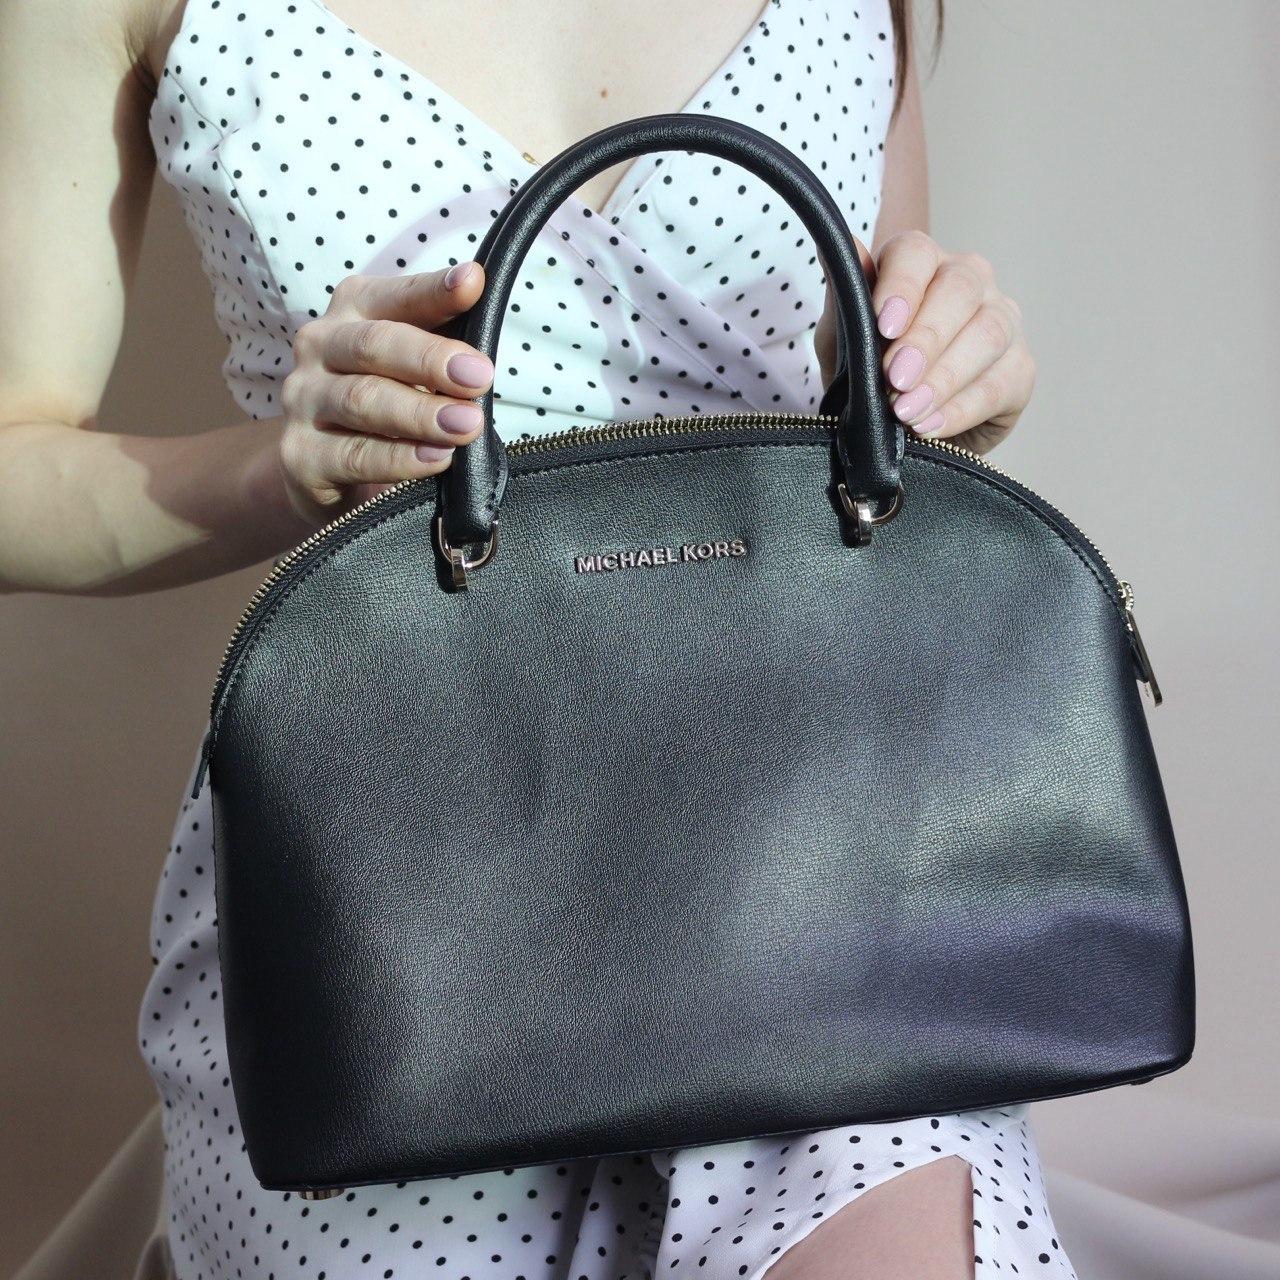 Сумка Michael Kors EMMY LG Dome Satchel Leather черная круглая с двумя ручками